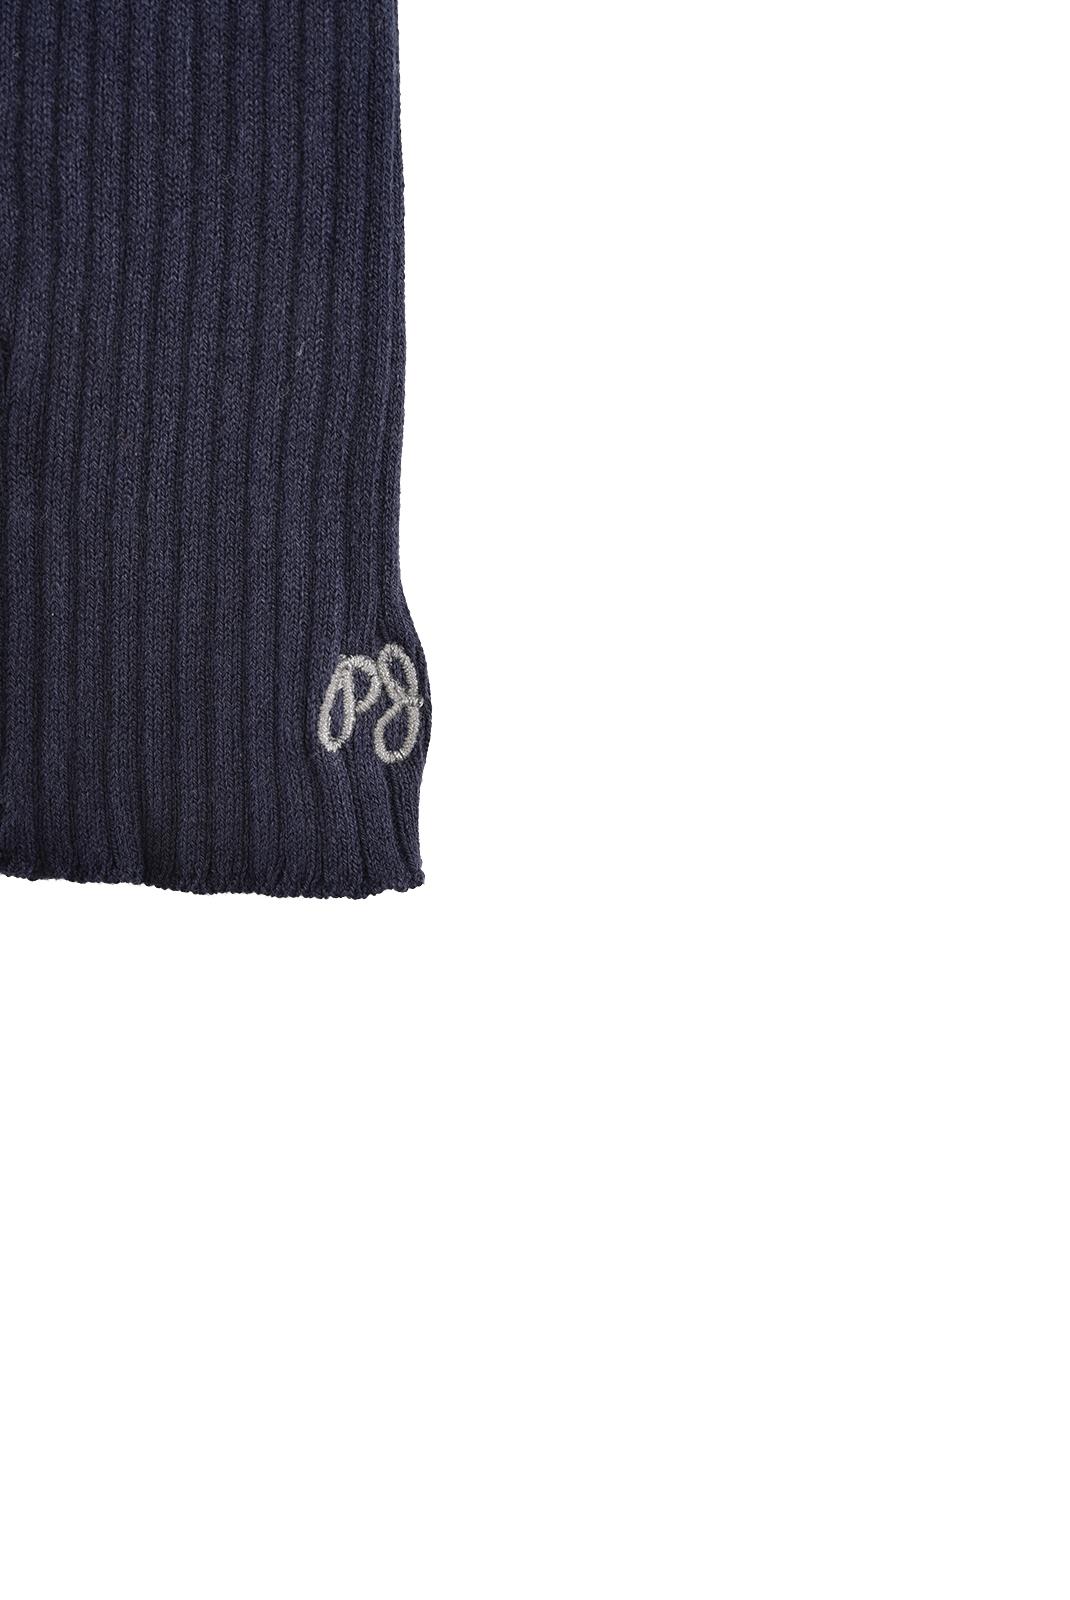 Bas  Pepe jeans PG210352 gillian 595 NAVY